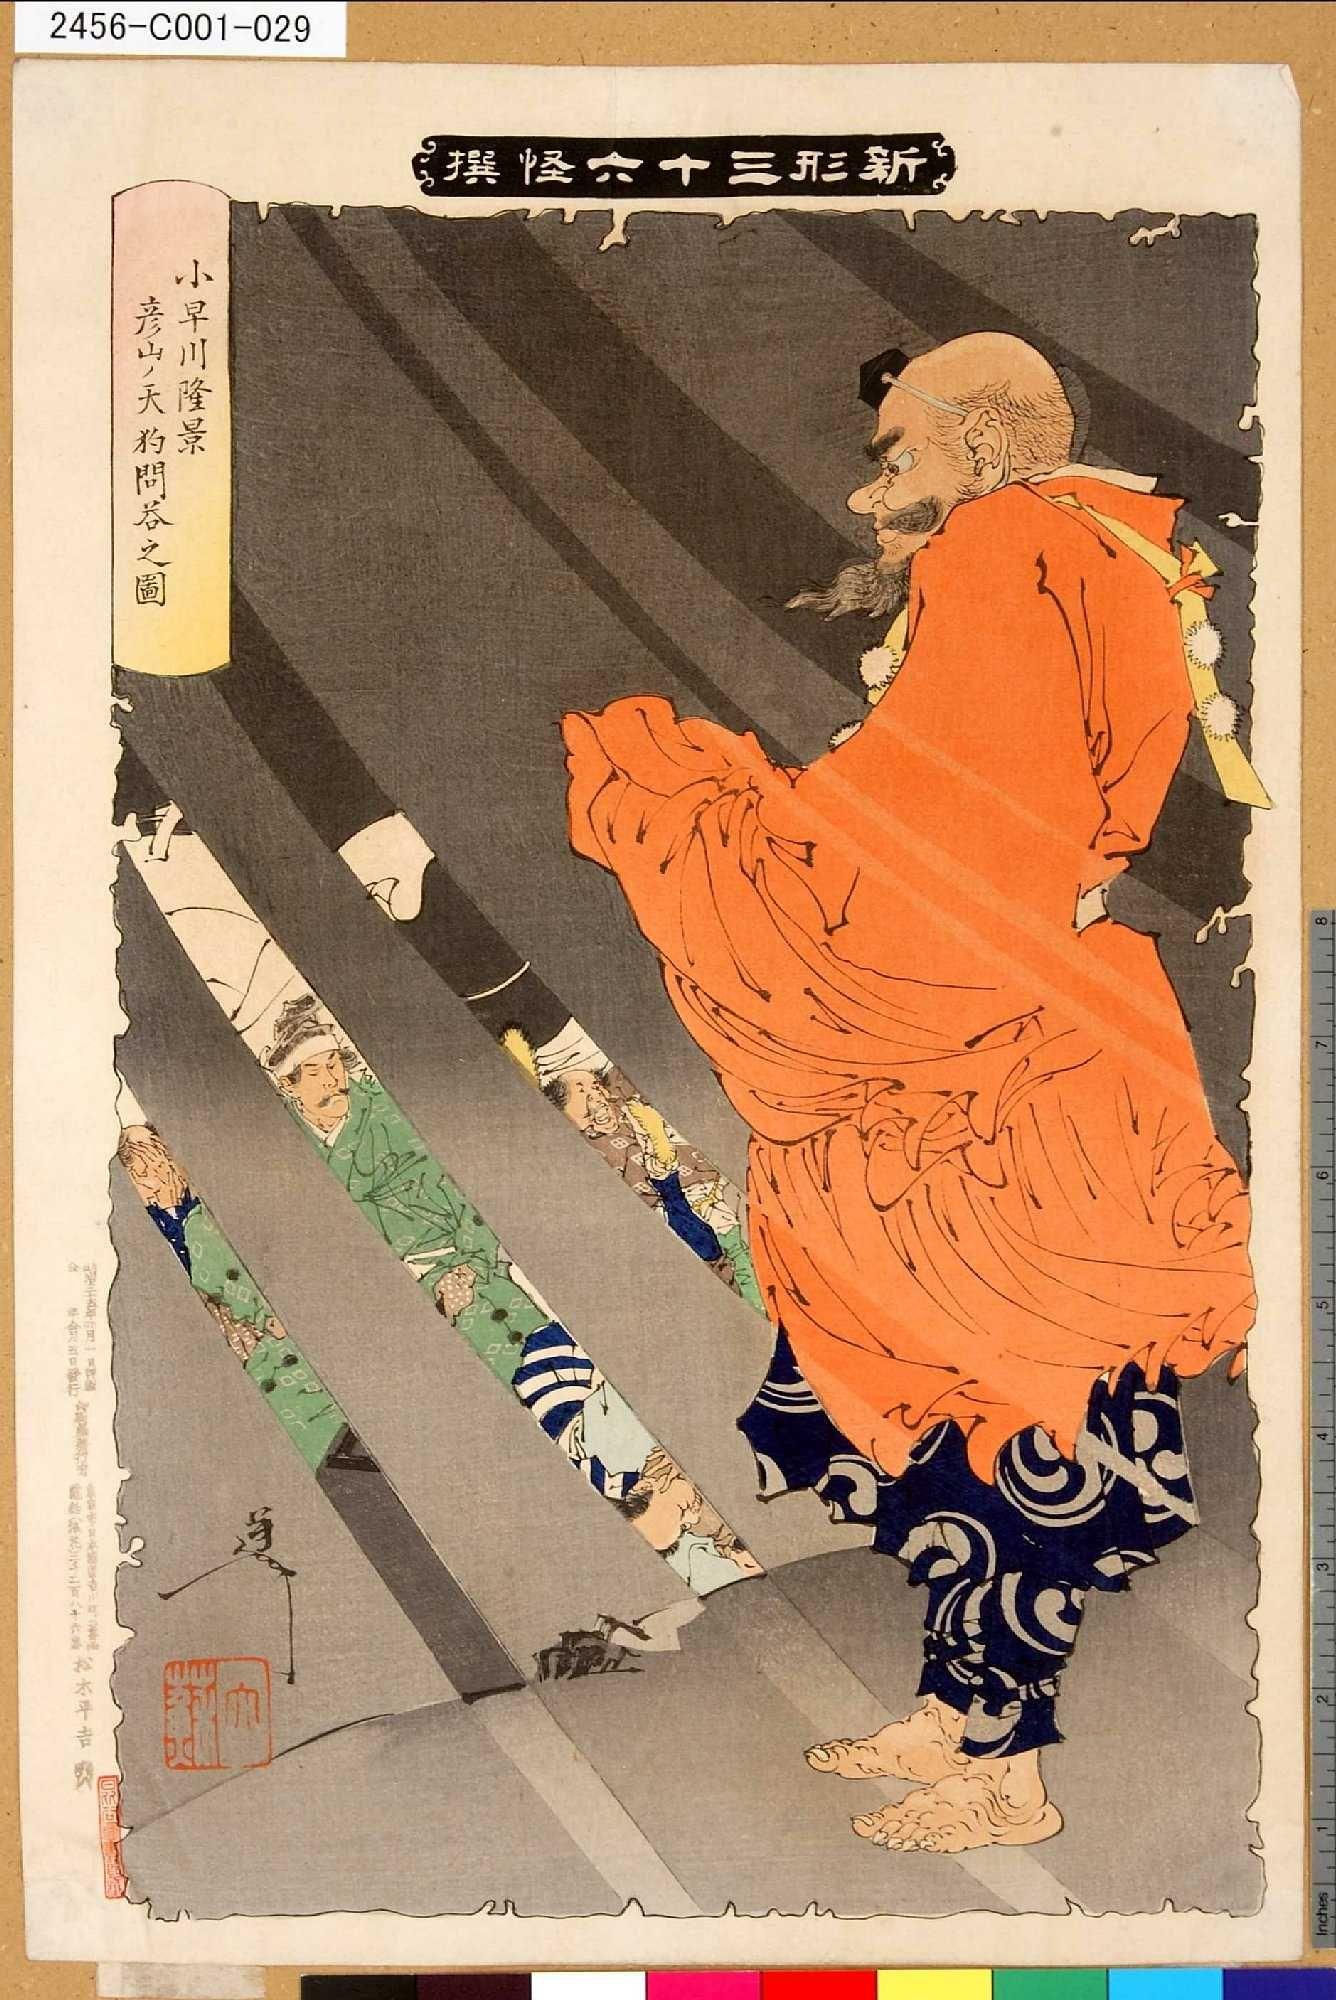 小早川隆景彦山ノ天狗問答之Kobayakawa Takakage Debating with the Tengu